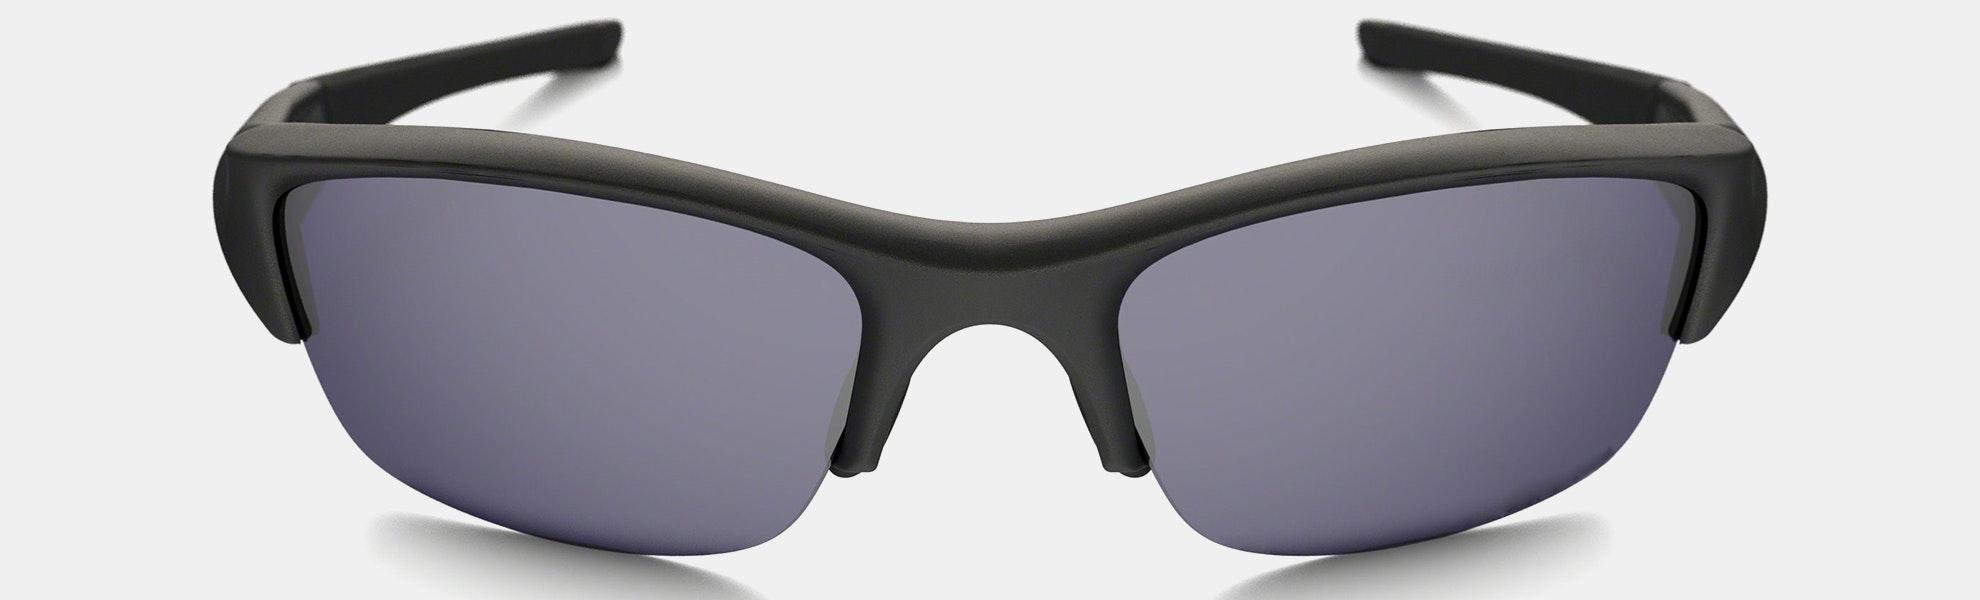 Oakley SI Flak Jacket Sunglasses